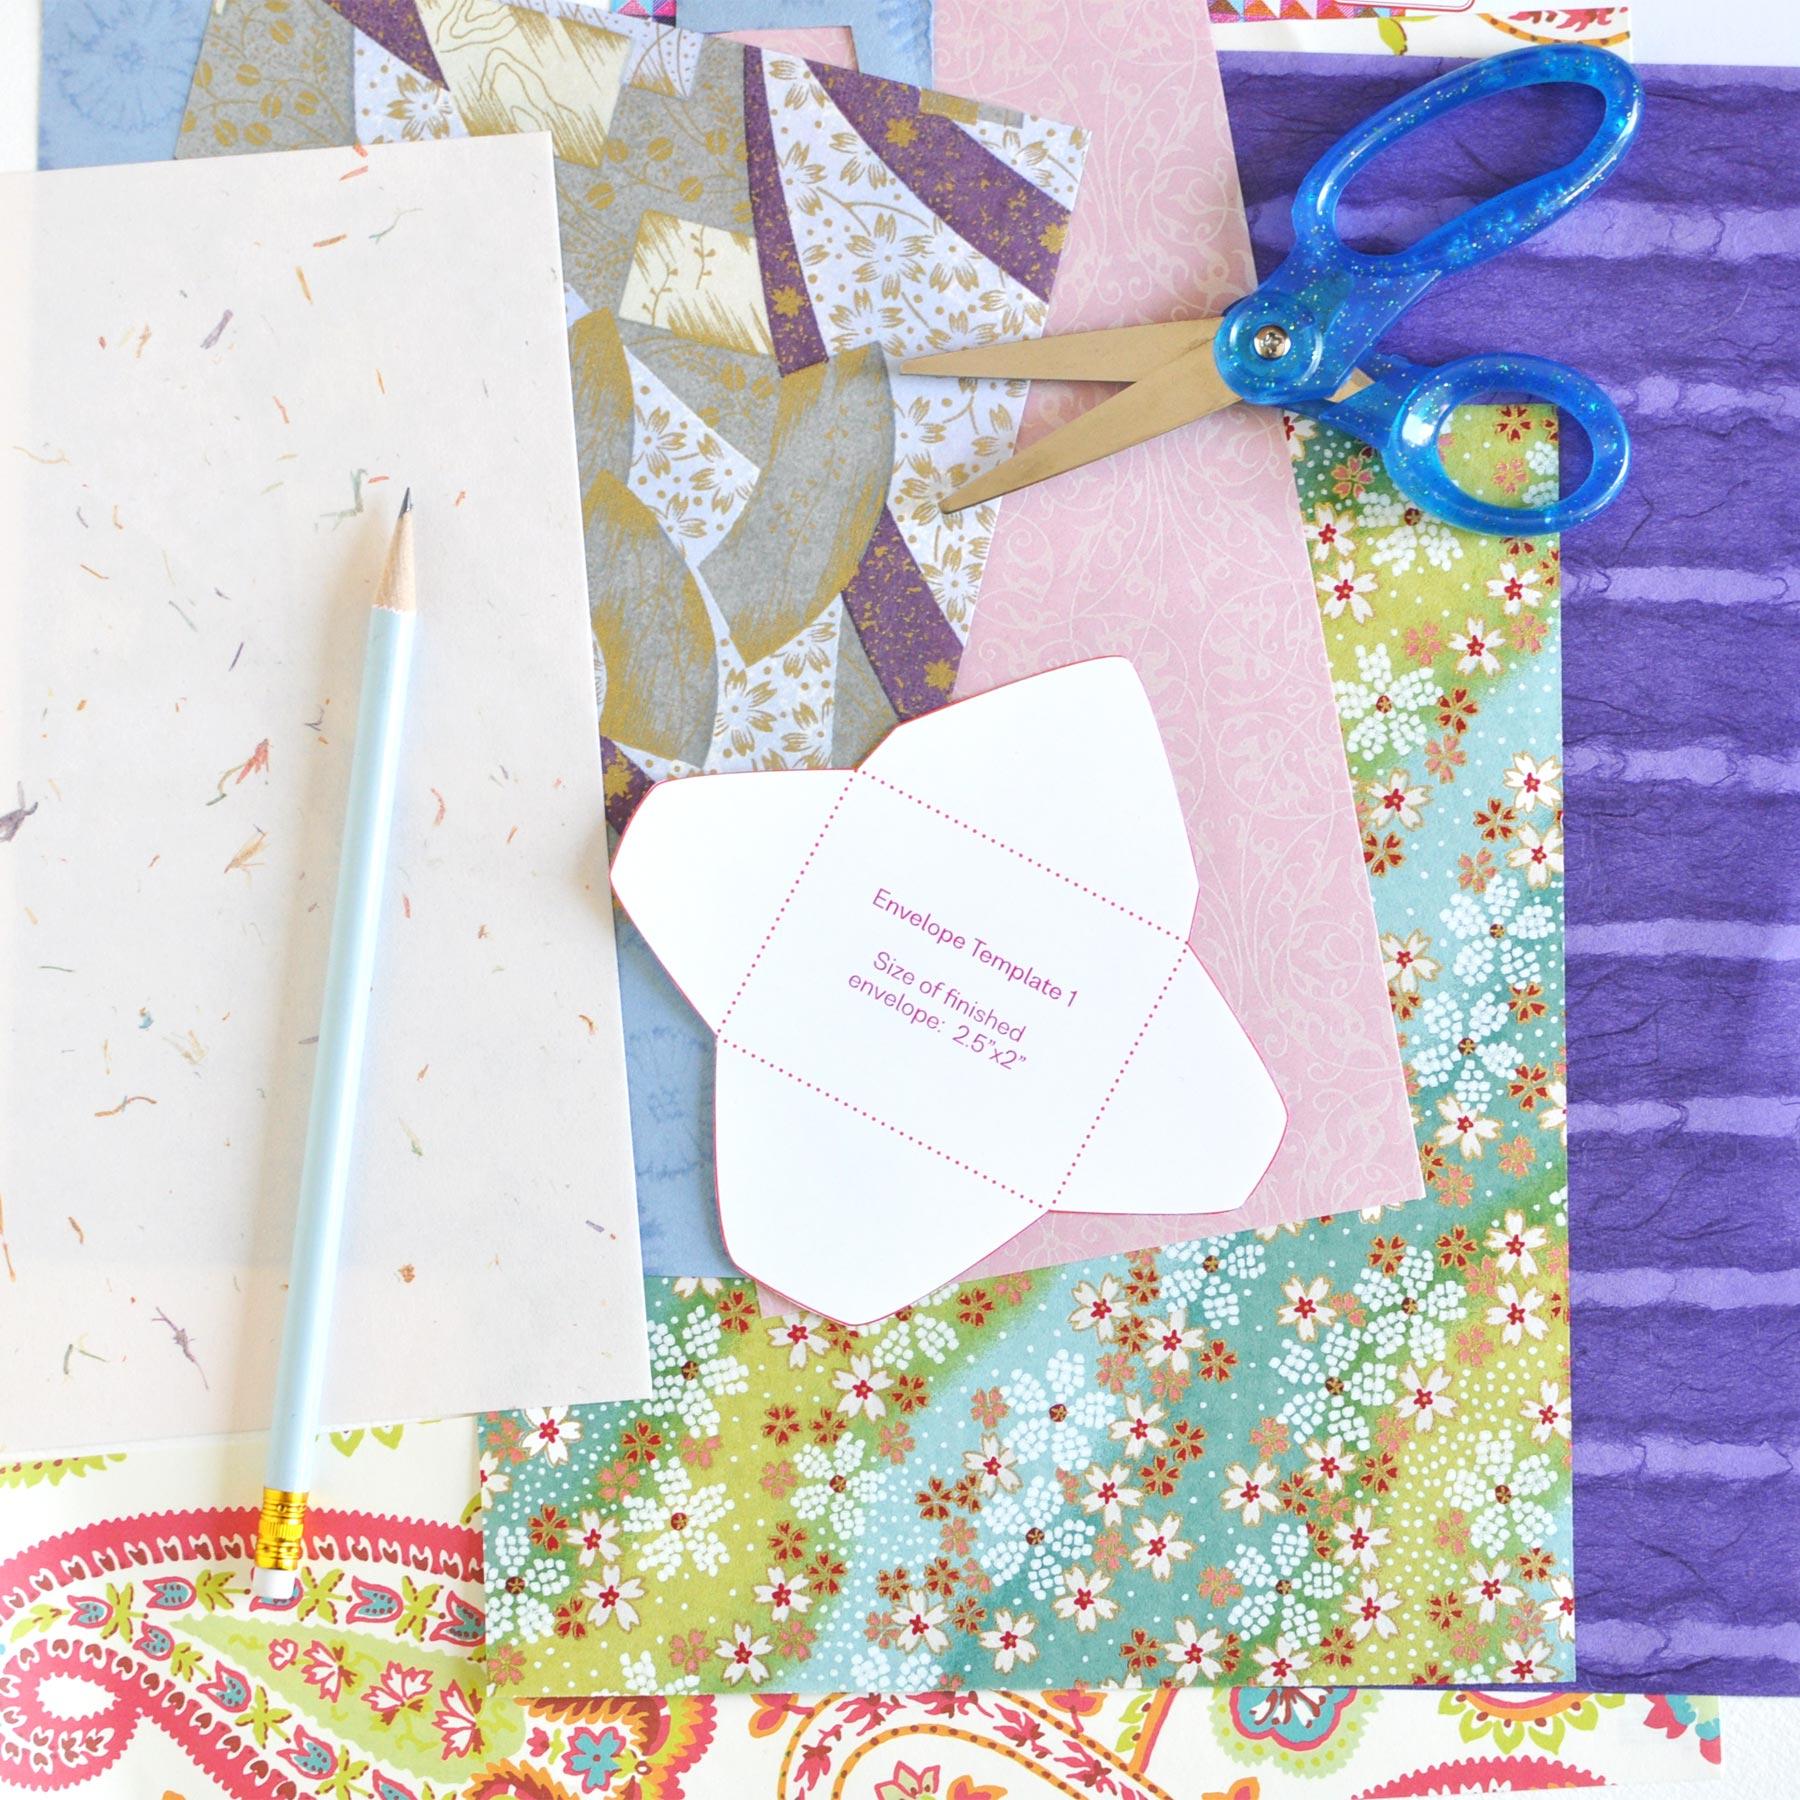 Envelope-Journal-Image-1.jpg